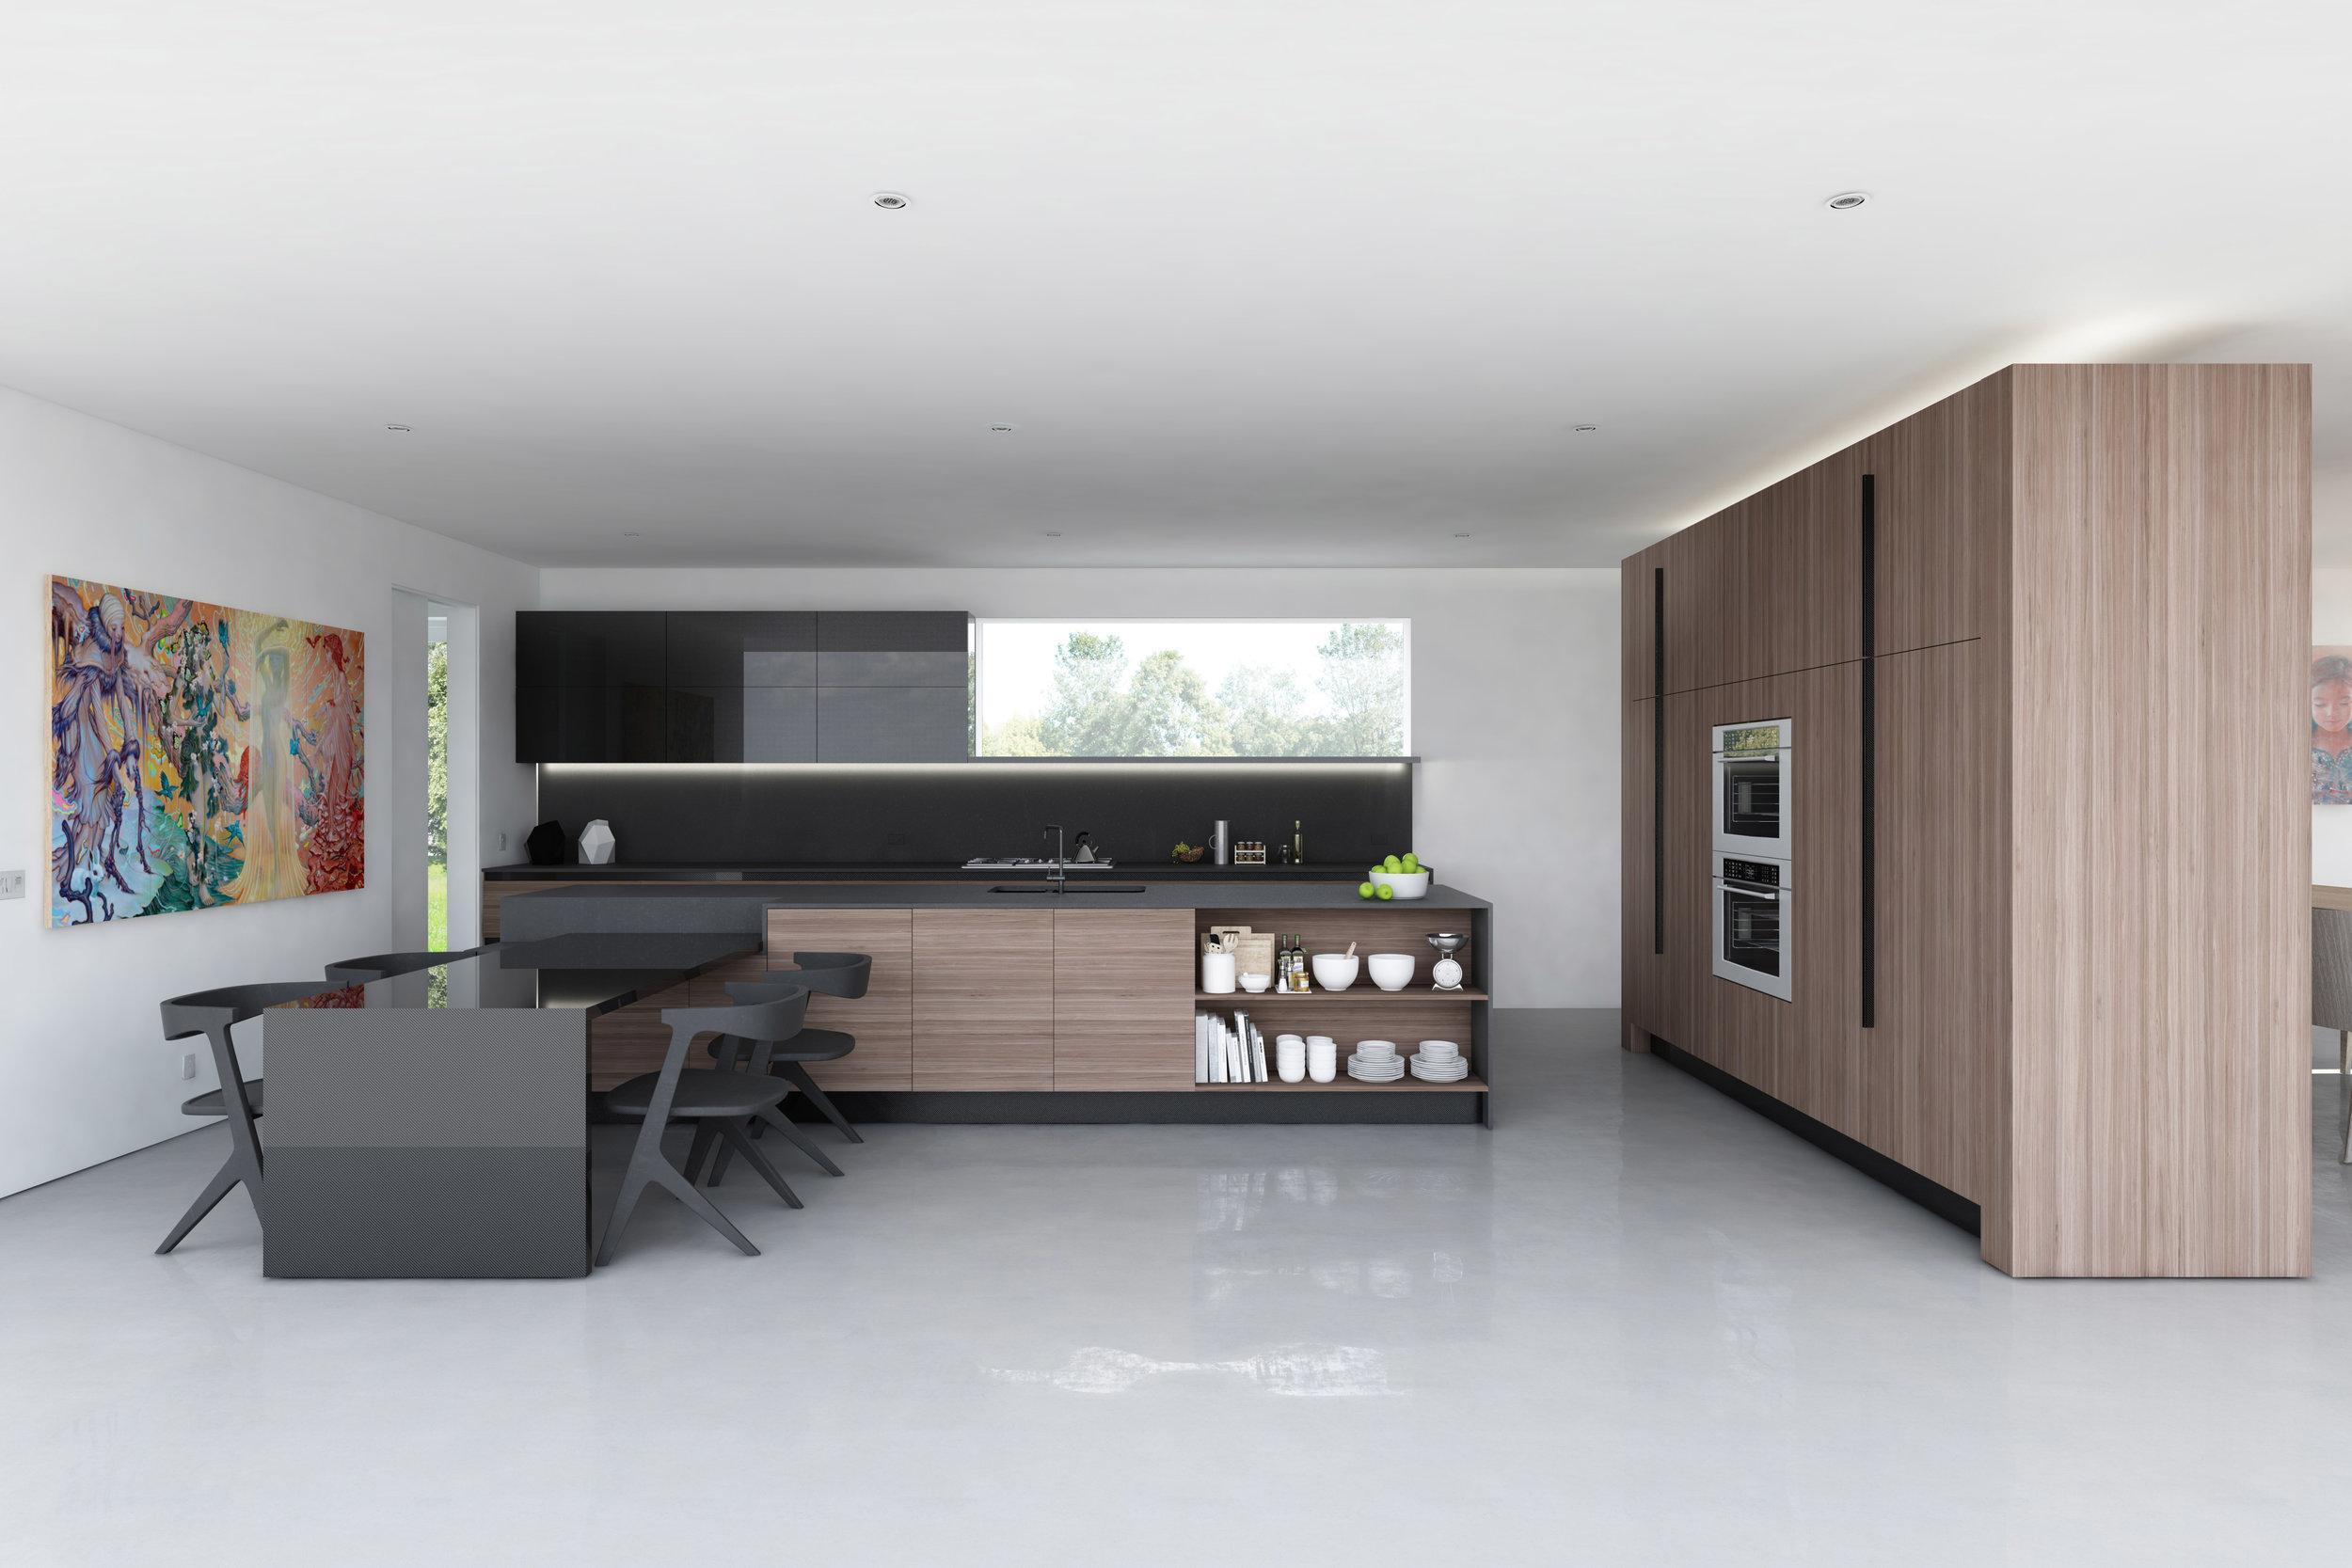 Rendering of the Bridge House kitchen